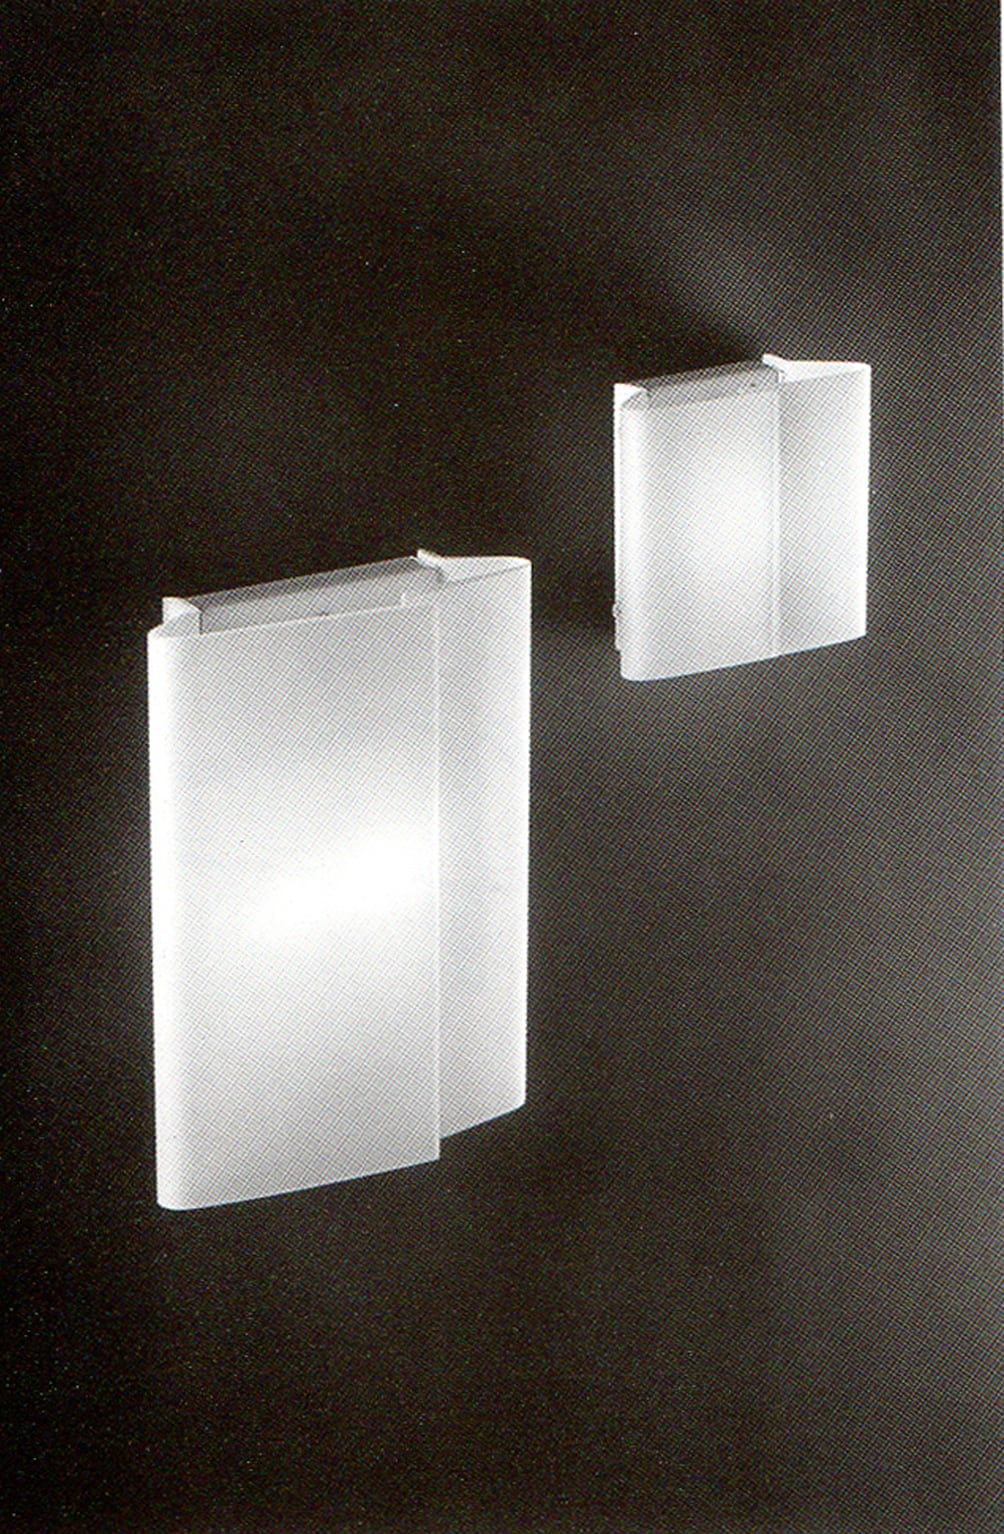 Nástěnná lampa Murano Due Beside Mini 100W R7s